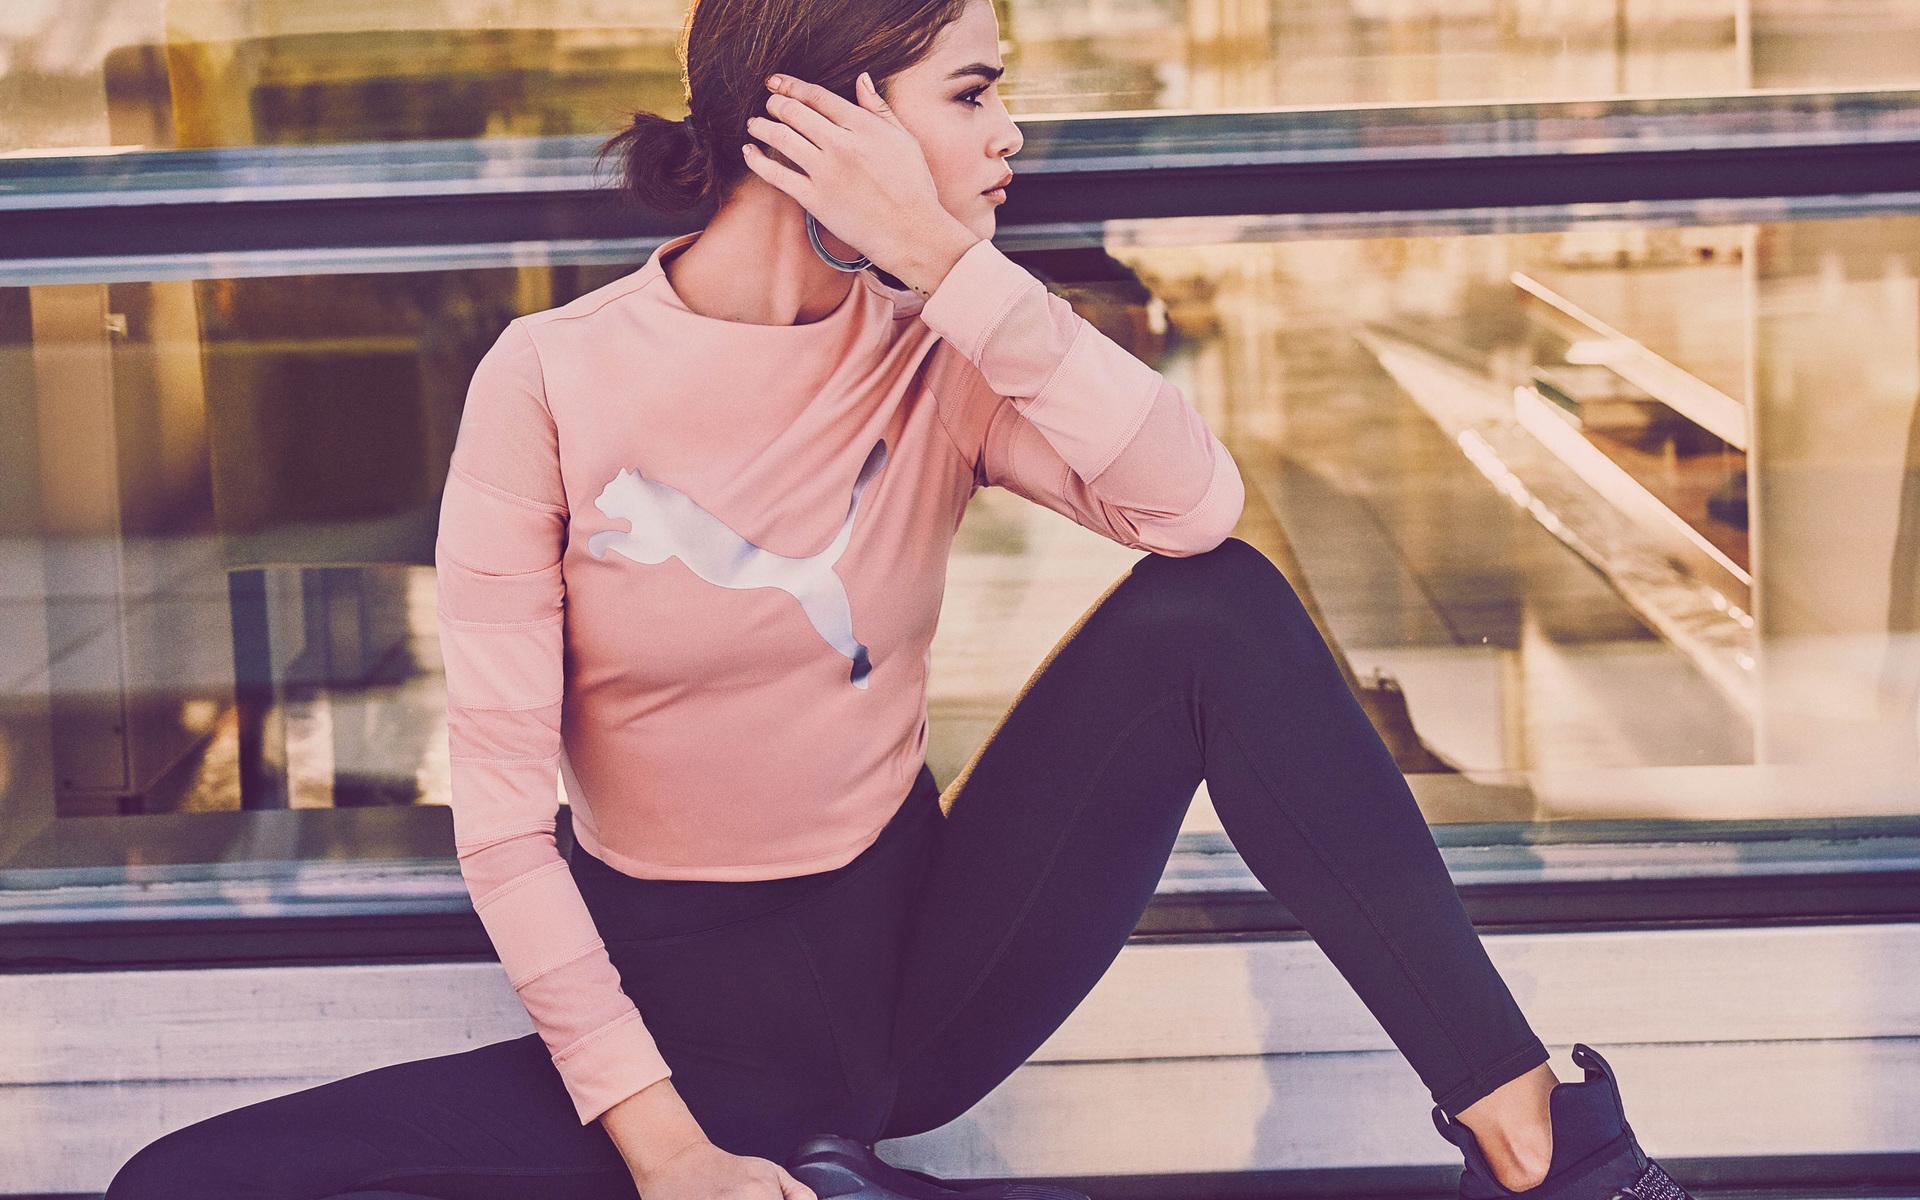 1920x1200 Selena Gomez Puma Campaign 2018 Photoshoot 4k ...